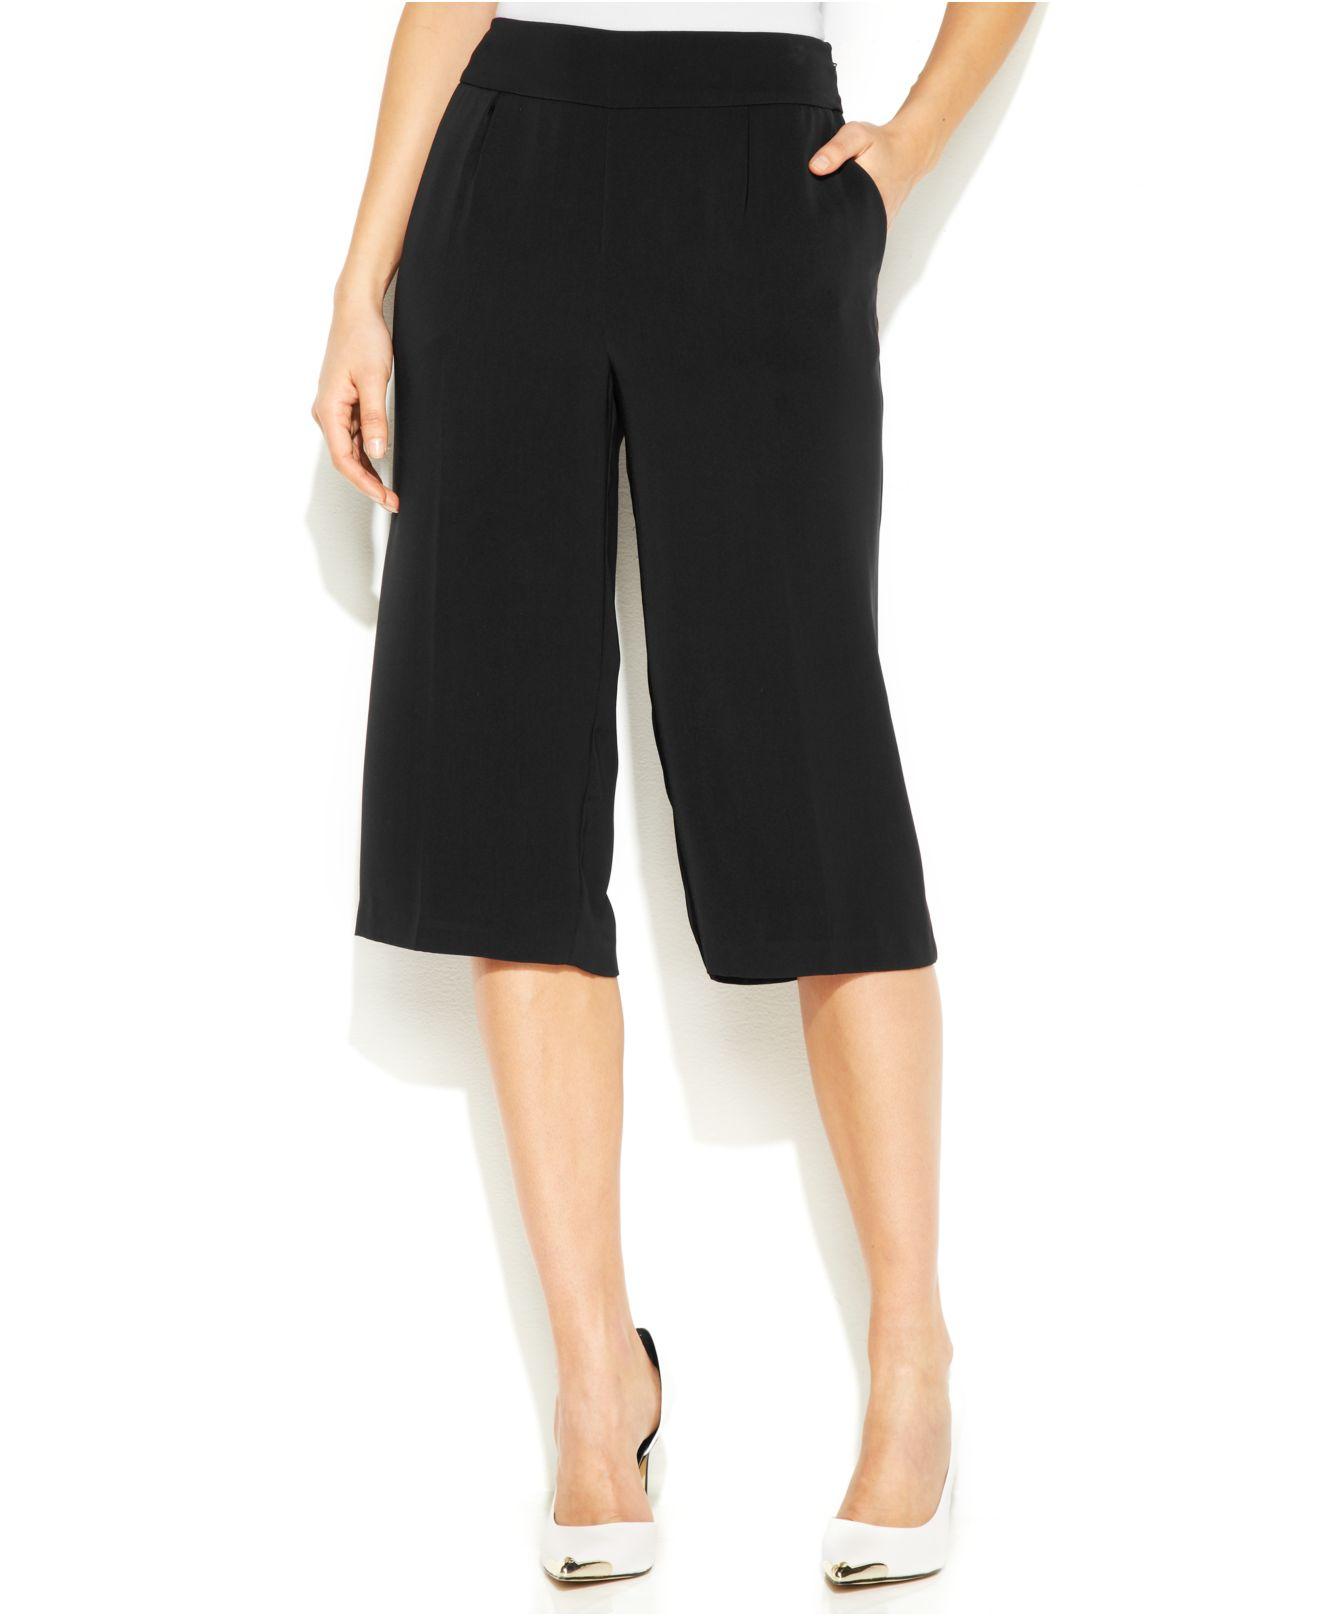 Dkny Wide-Leg Cropped Gaucho Pants in Black | Lyst